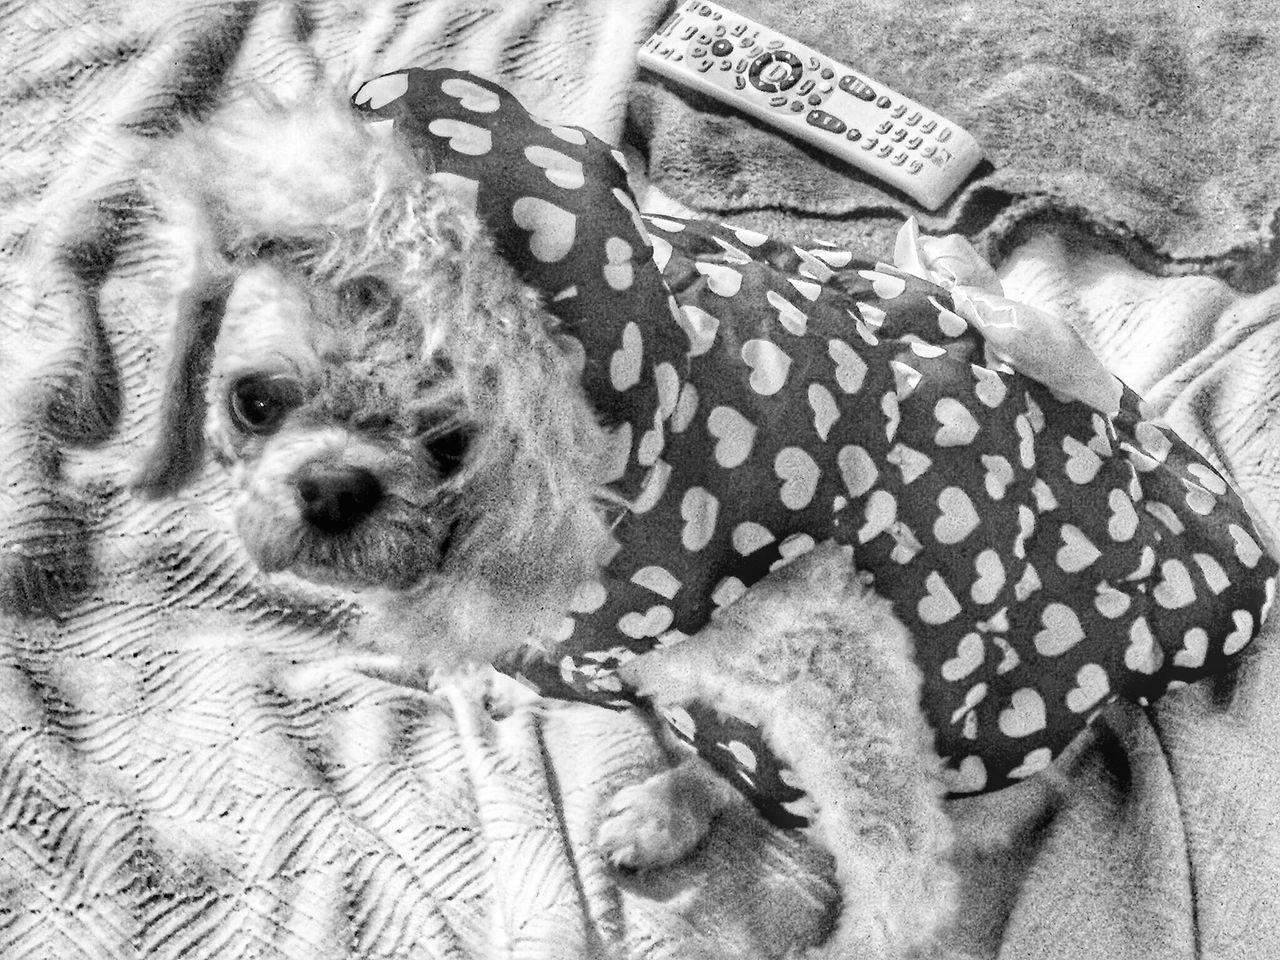 Chuchi❤ Dog Dogs Of EyeEm Inside Day Winter Coat Winter Fashion One Animal Animal Themes Portrait Domestic Animals Pets Looking At Camera Animal Head  Zoology Footpath Loyalty No People Blackandwhite Monochrome Photography